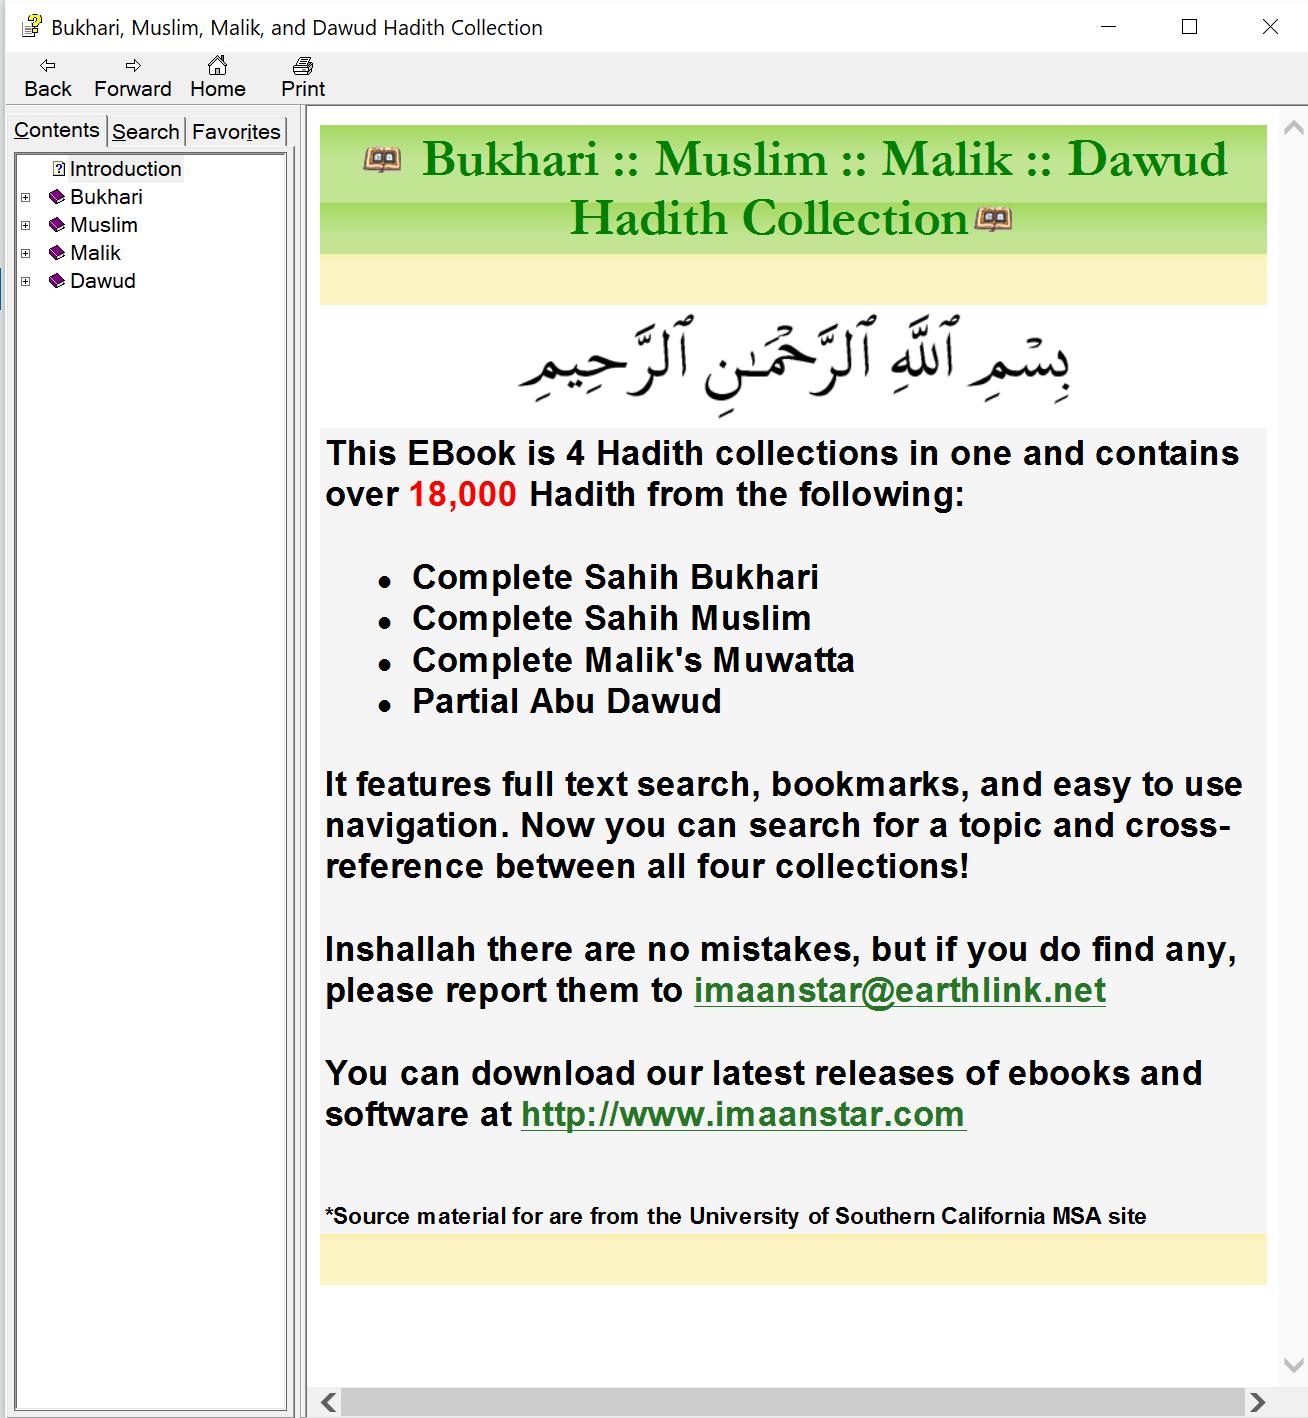 ImaanStar: Bukhari, Muslim, Malik, and Dawud Hadith Collection